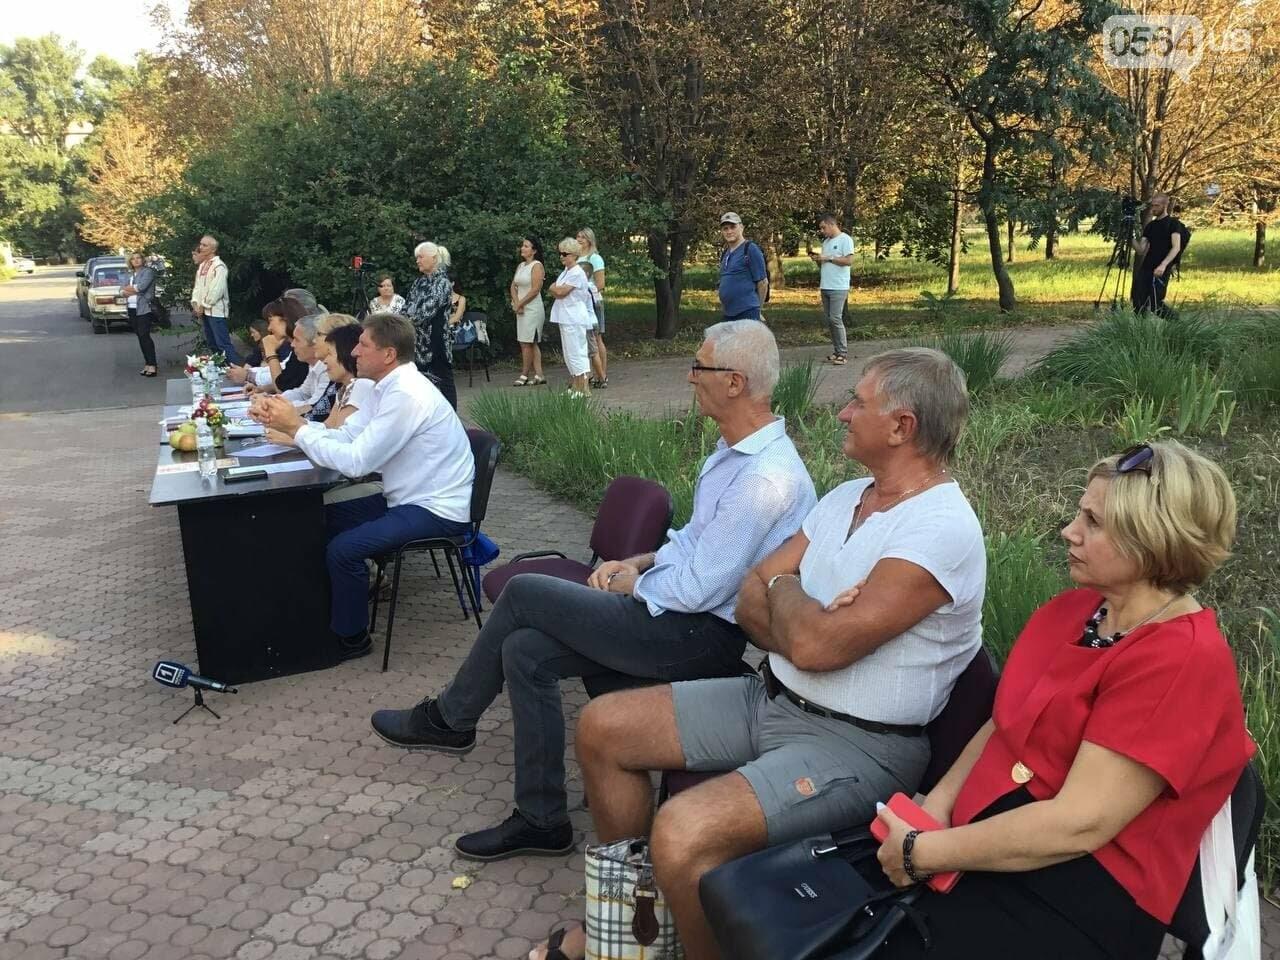 18 конкурсантов представили своё творчество на 5-м Криворожском фестивале имени Кузьмы Скрябина, - ФОТО, ВИДЕО, фото-18